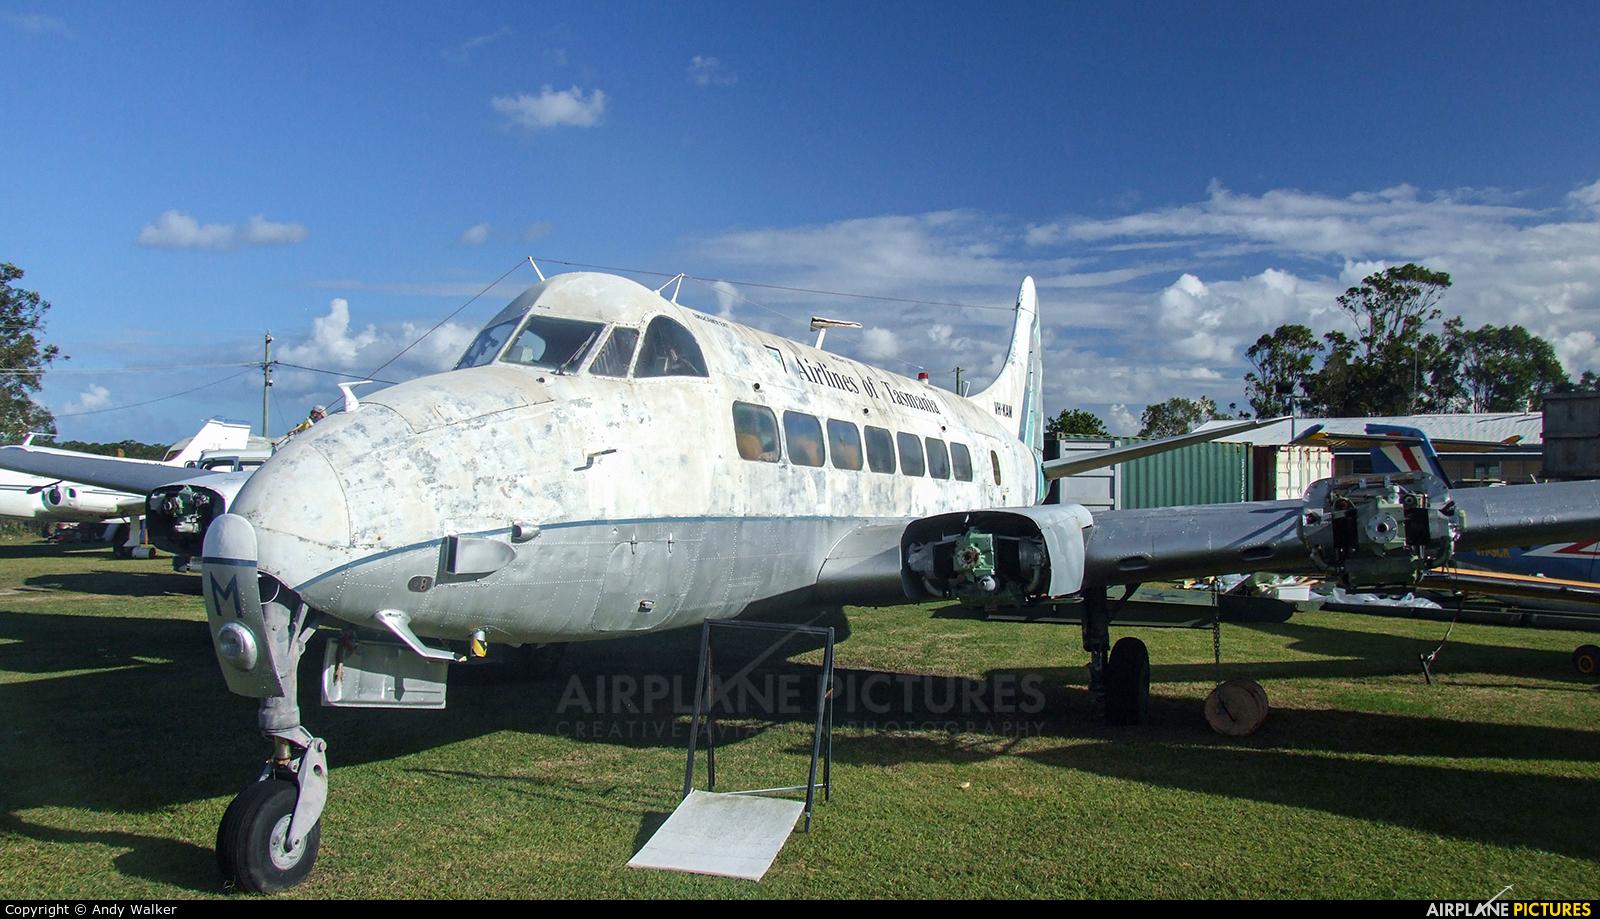 Queensland Air Museum Collection VH-KAM aircraft at Caloundra, QLD